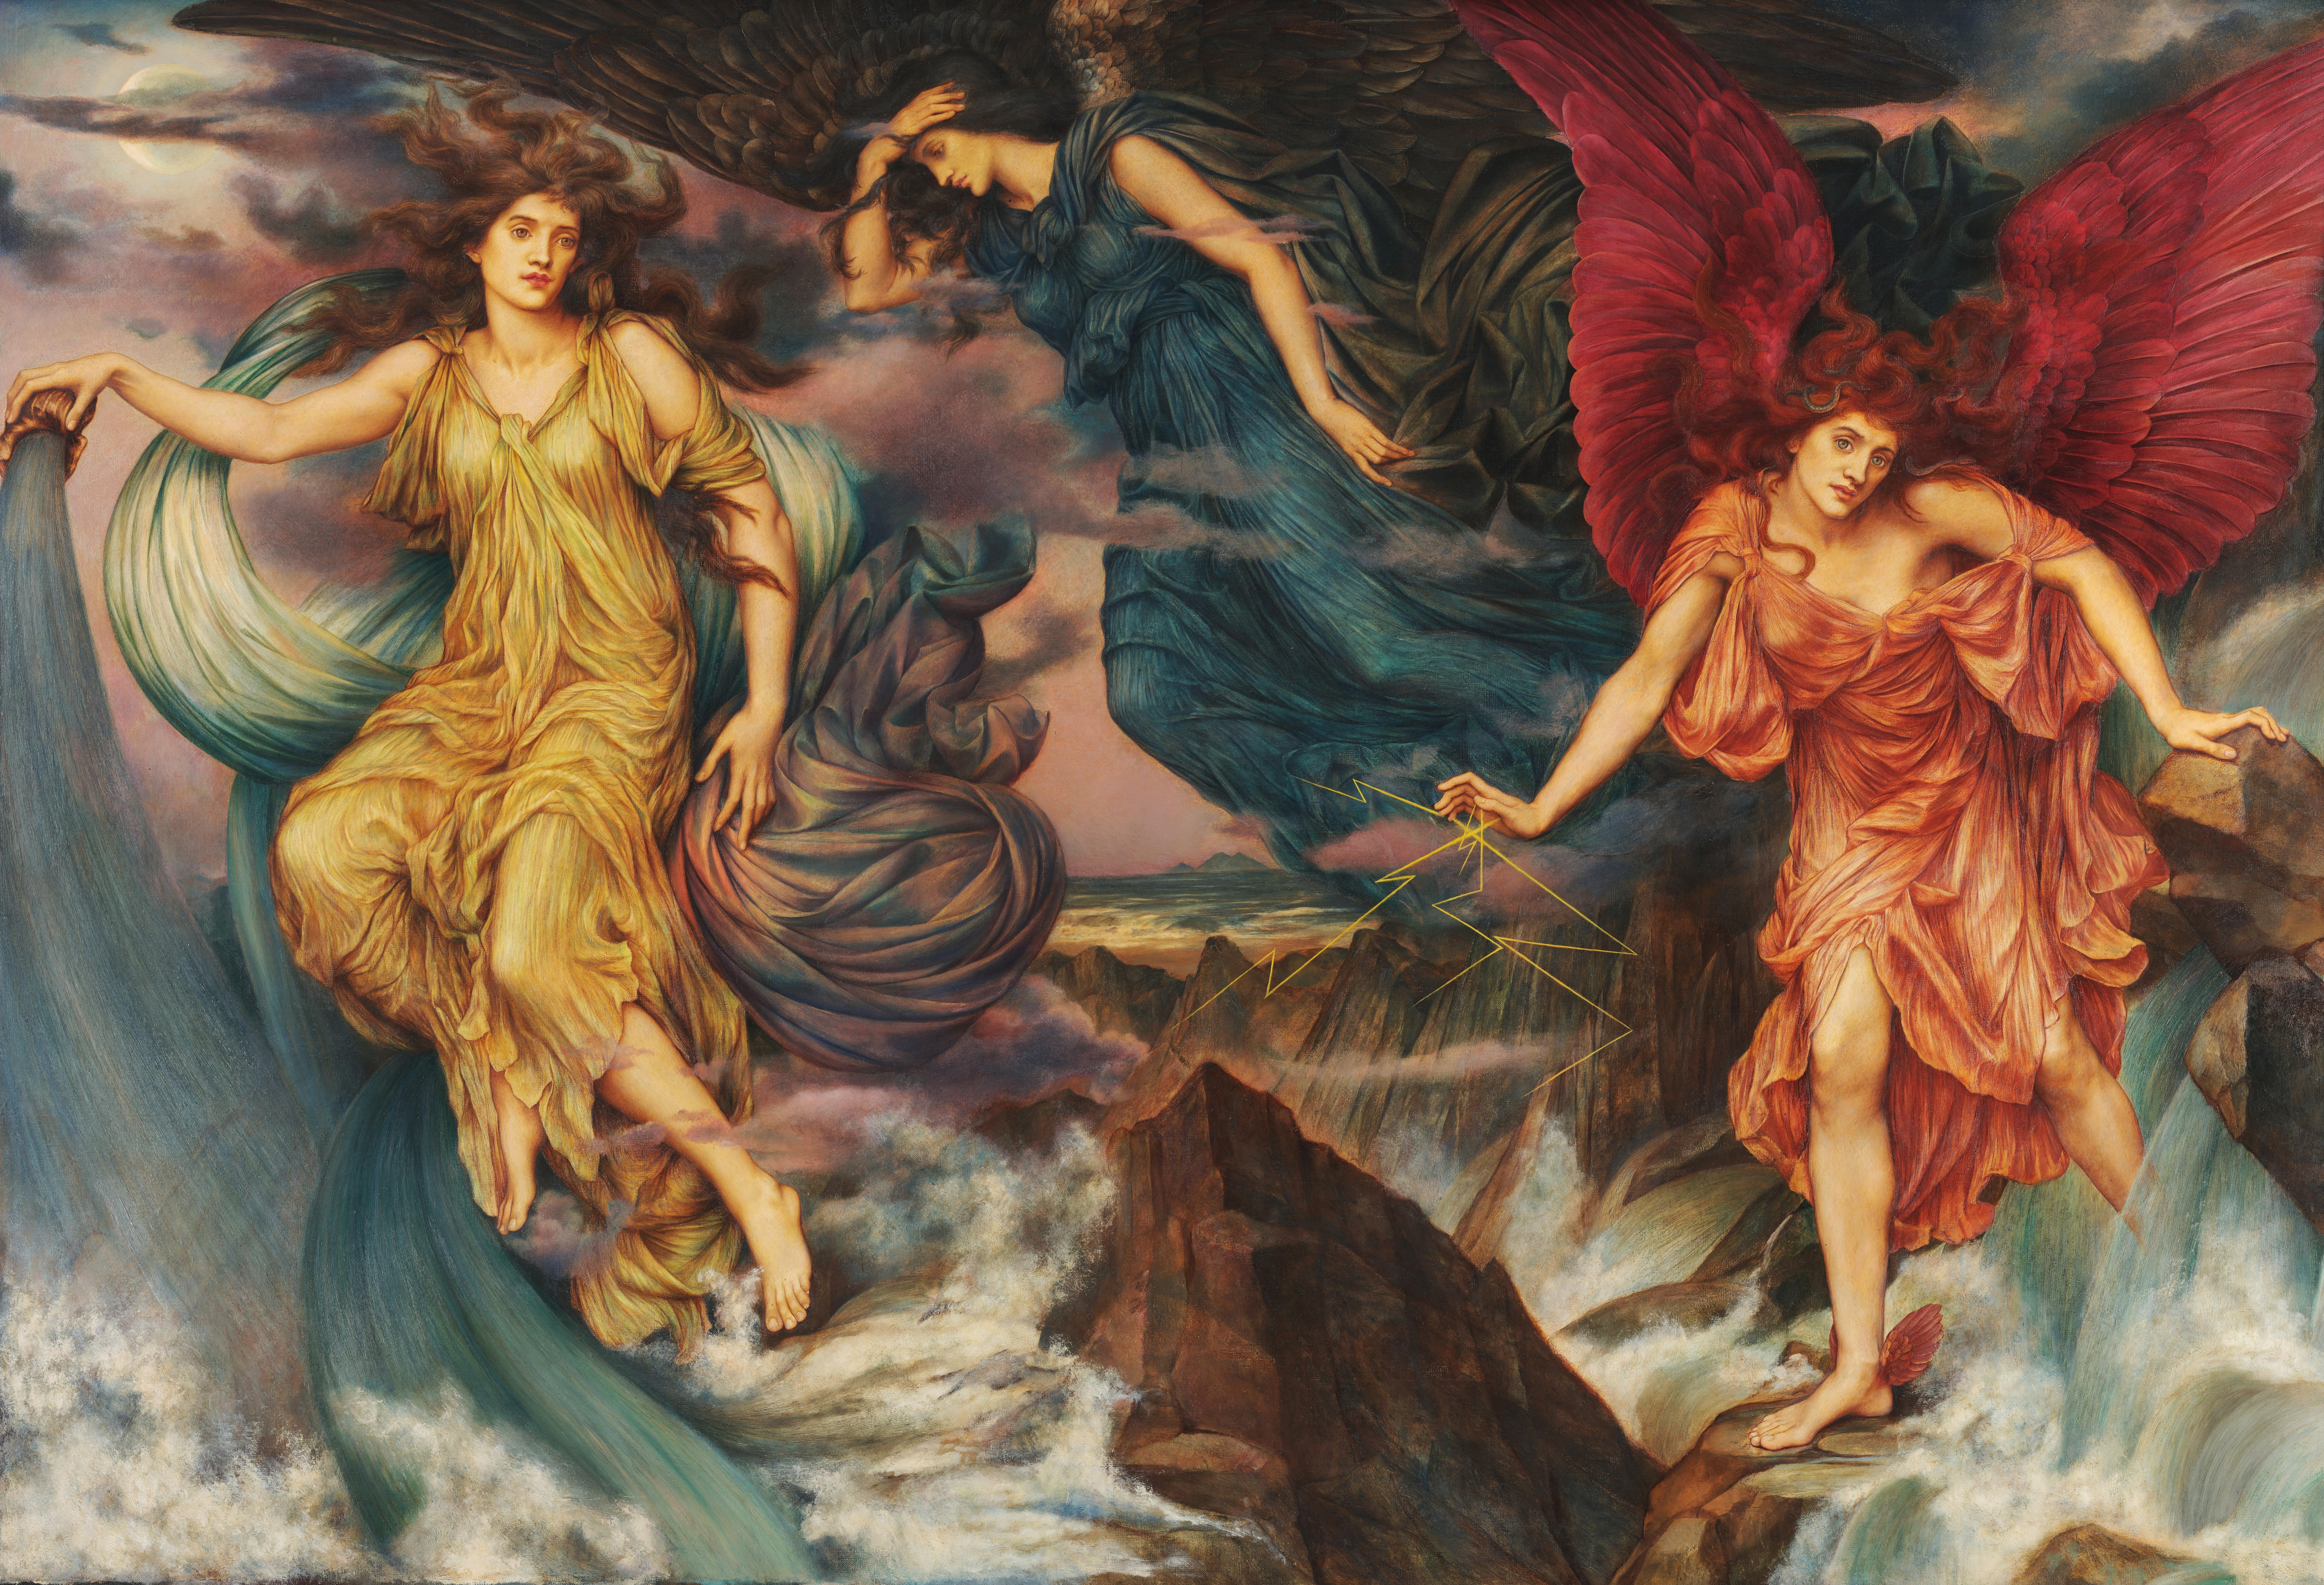 Biografia y Obras de los Pintores de la Hermandad Prerrafaelita - I - Página 2 The_Storm_Spirits